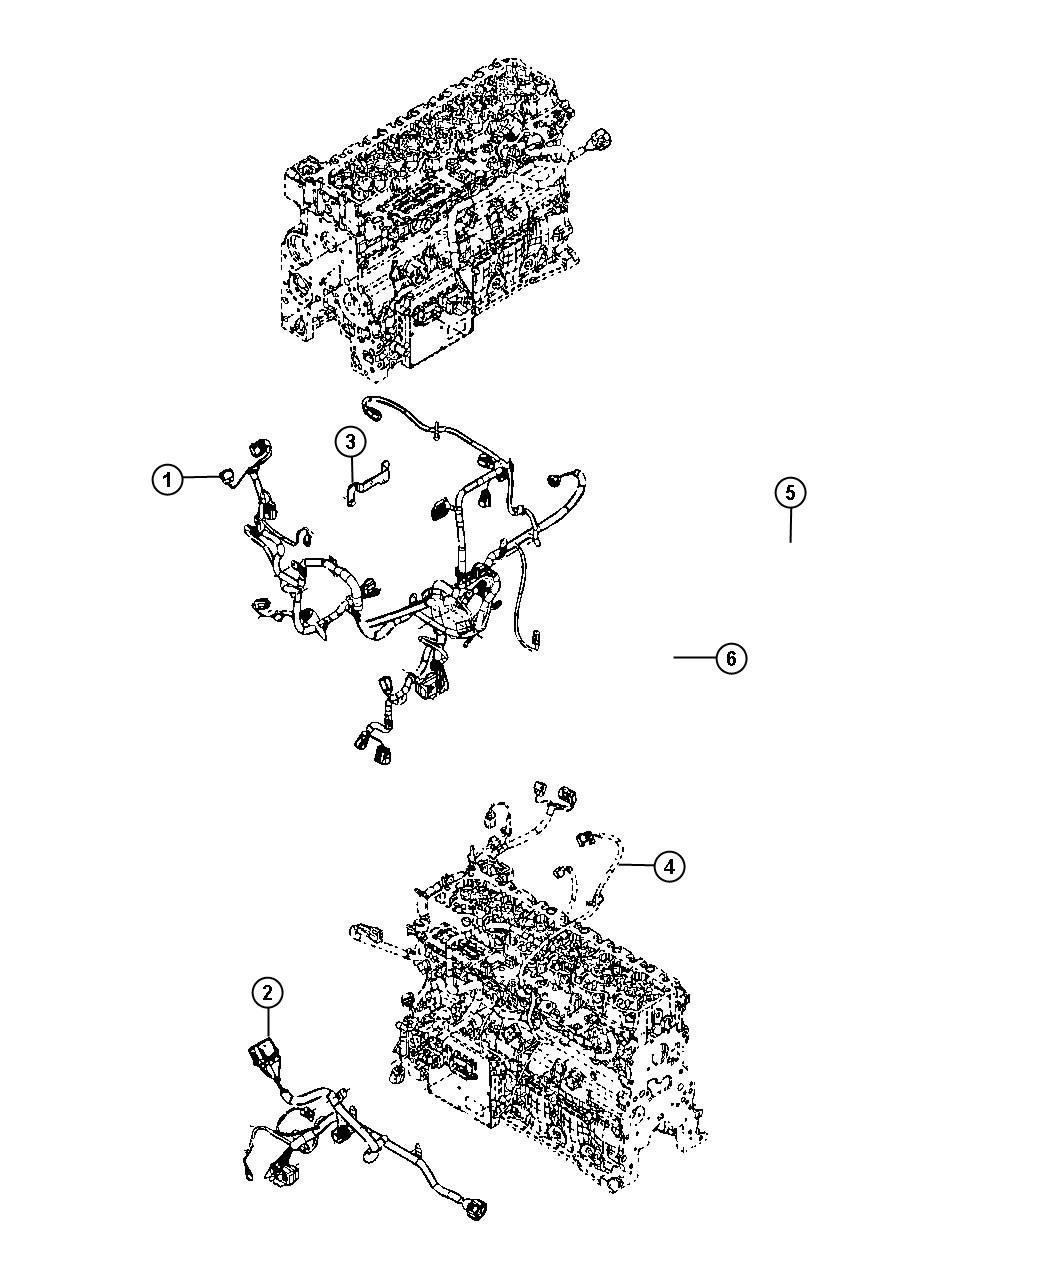 Dodge Ram 2500 Wiring. Engine. Emissions, state